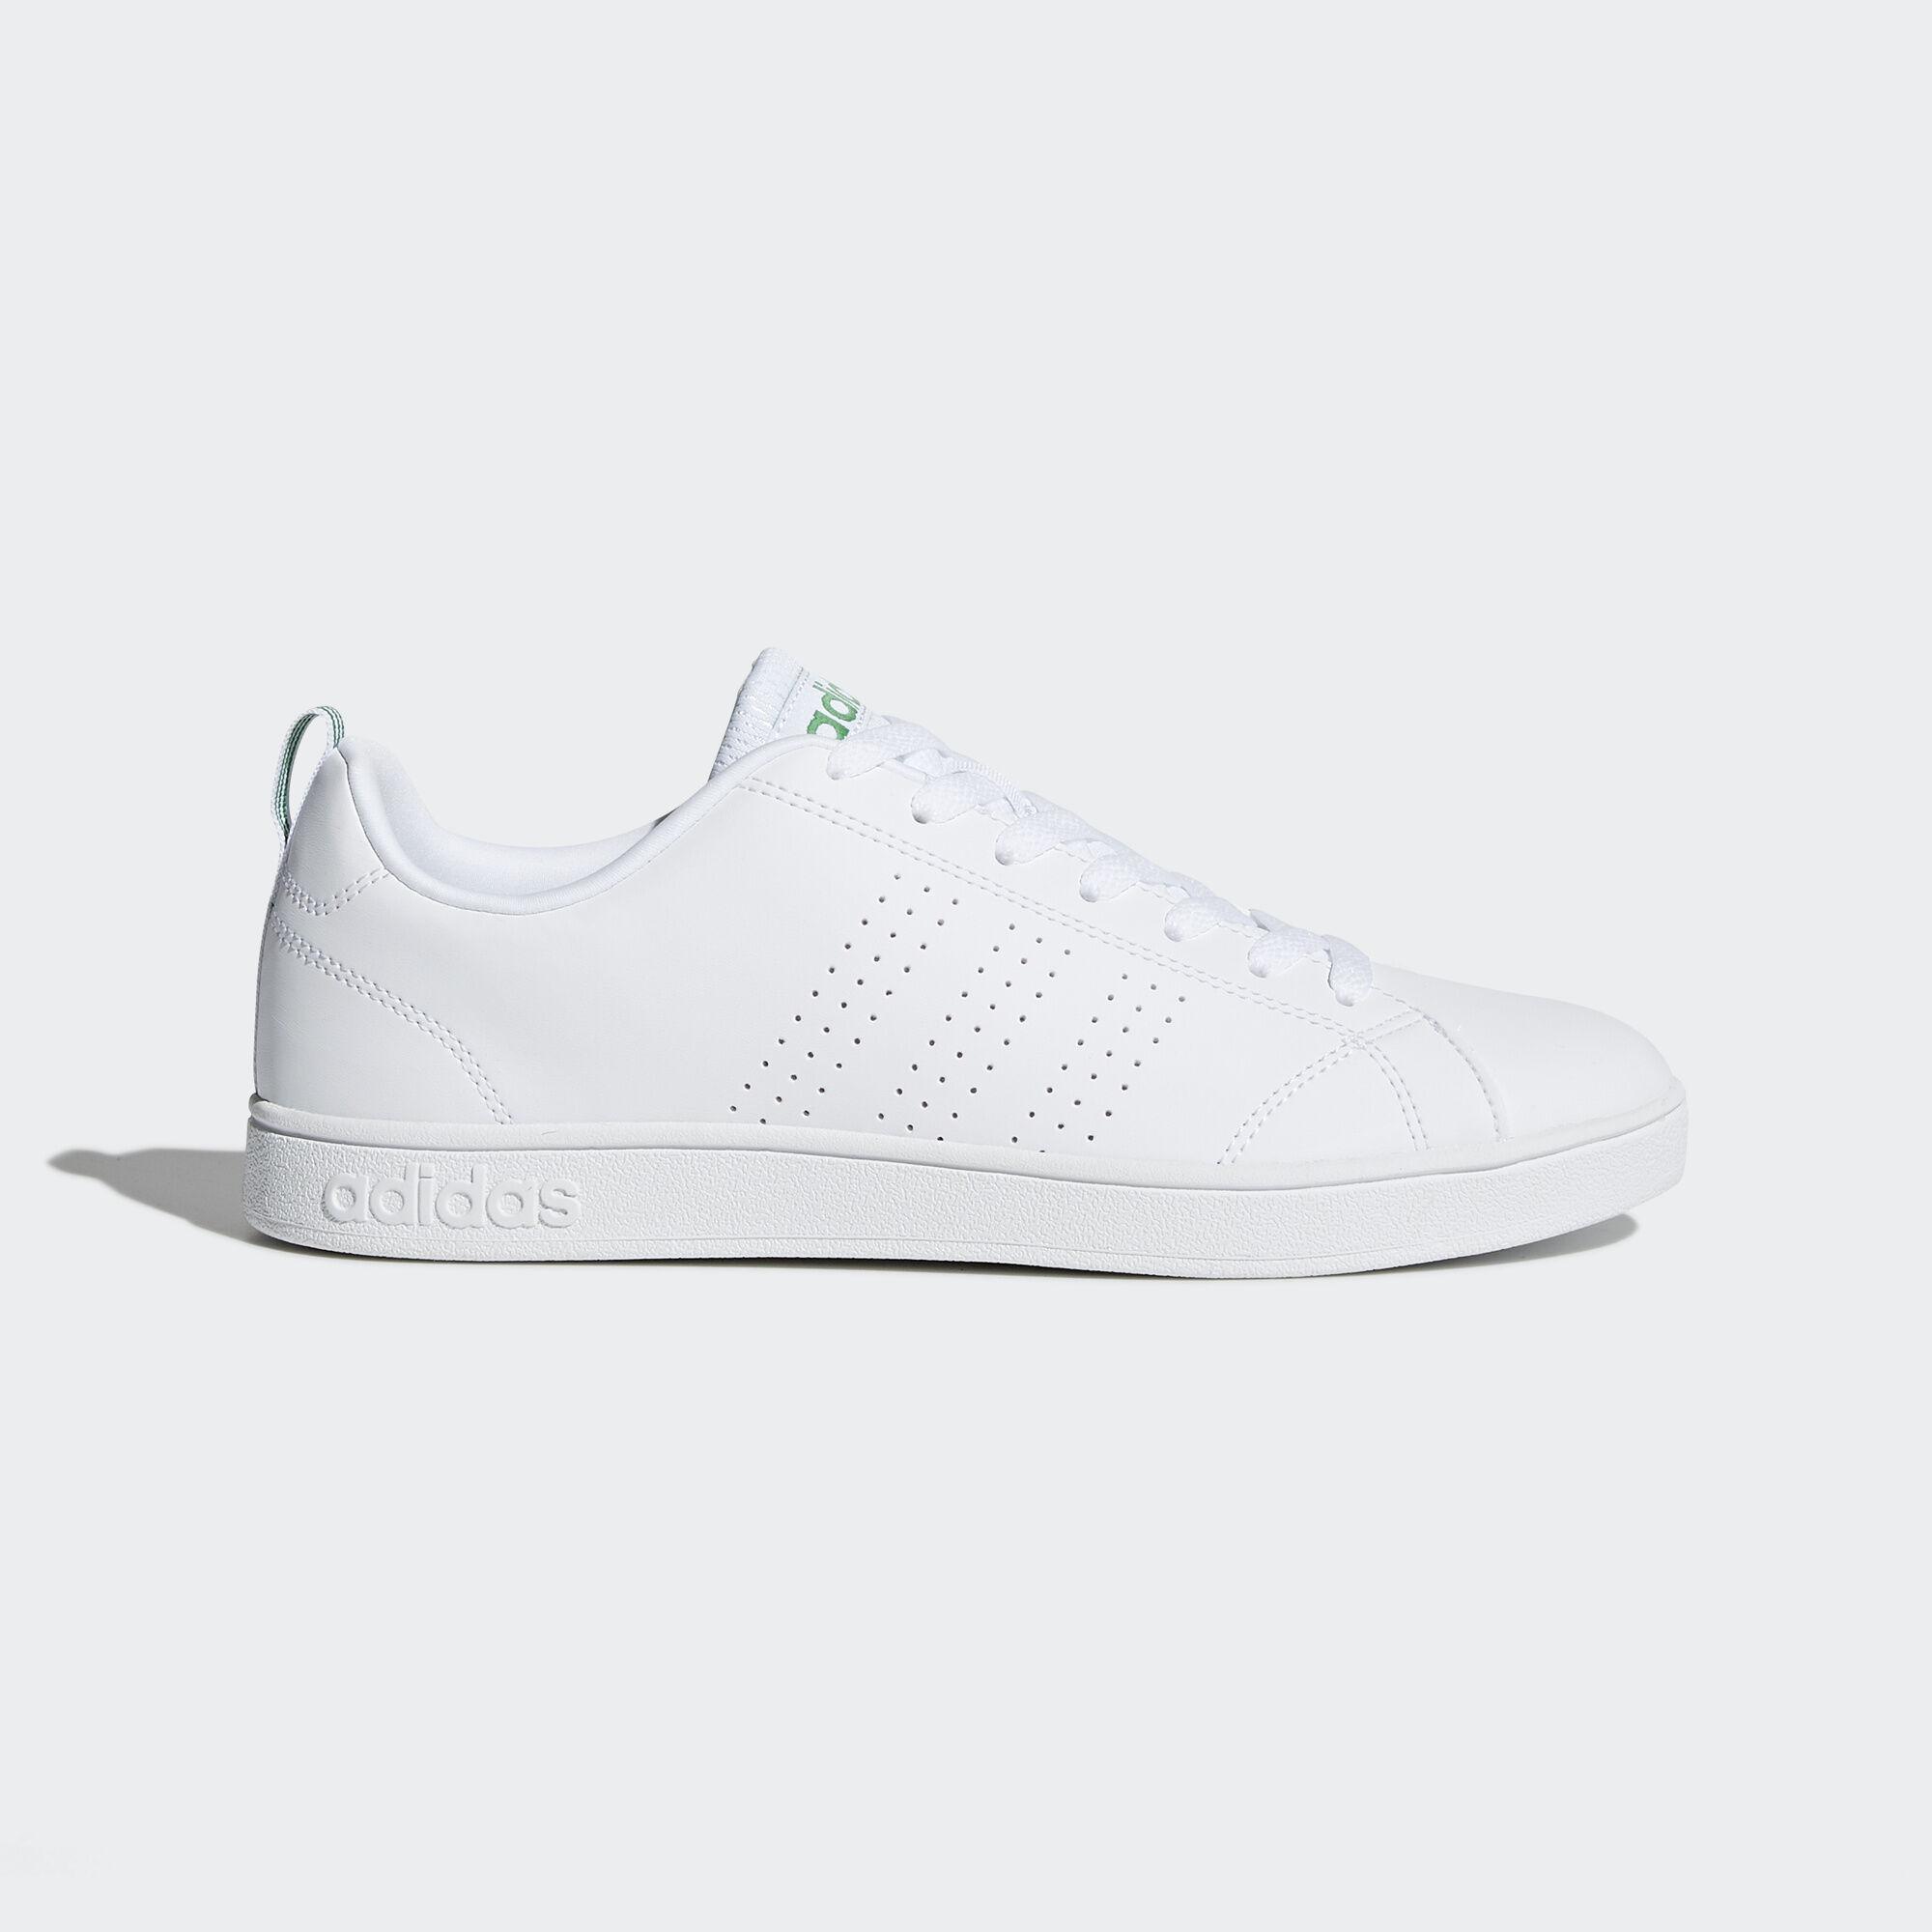 Adidas Neo Advantage Clean Vs